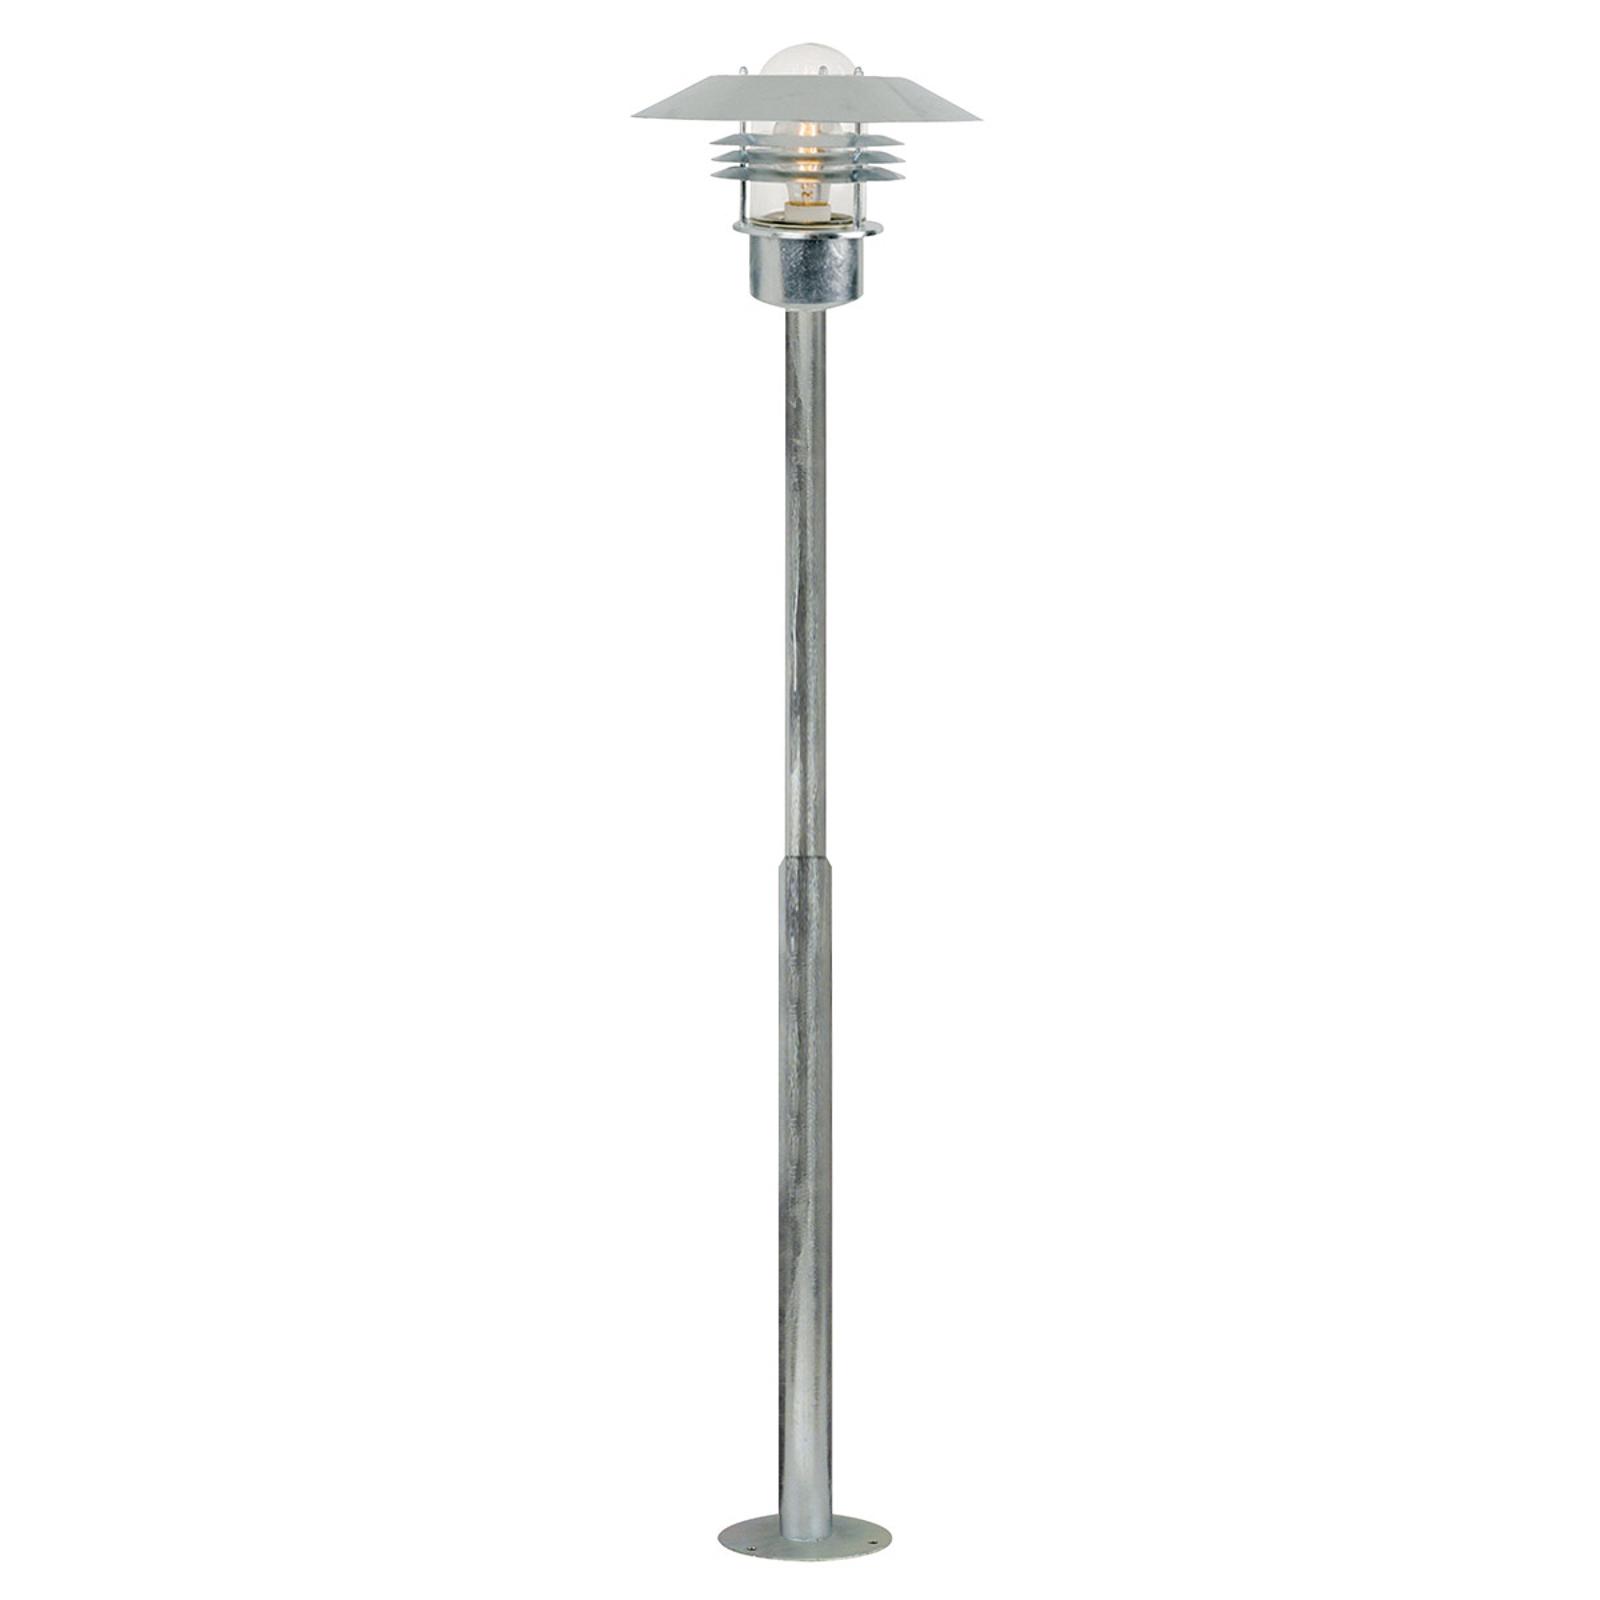 lampada a palo Vejers ad altezza regolabile